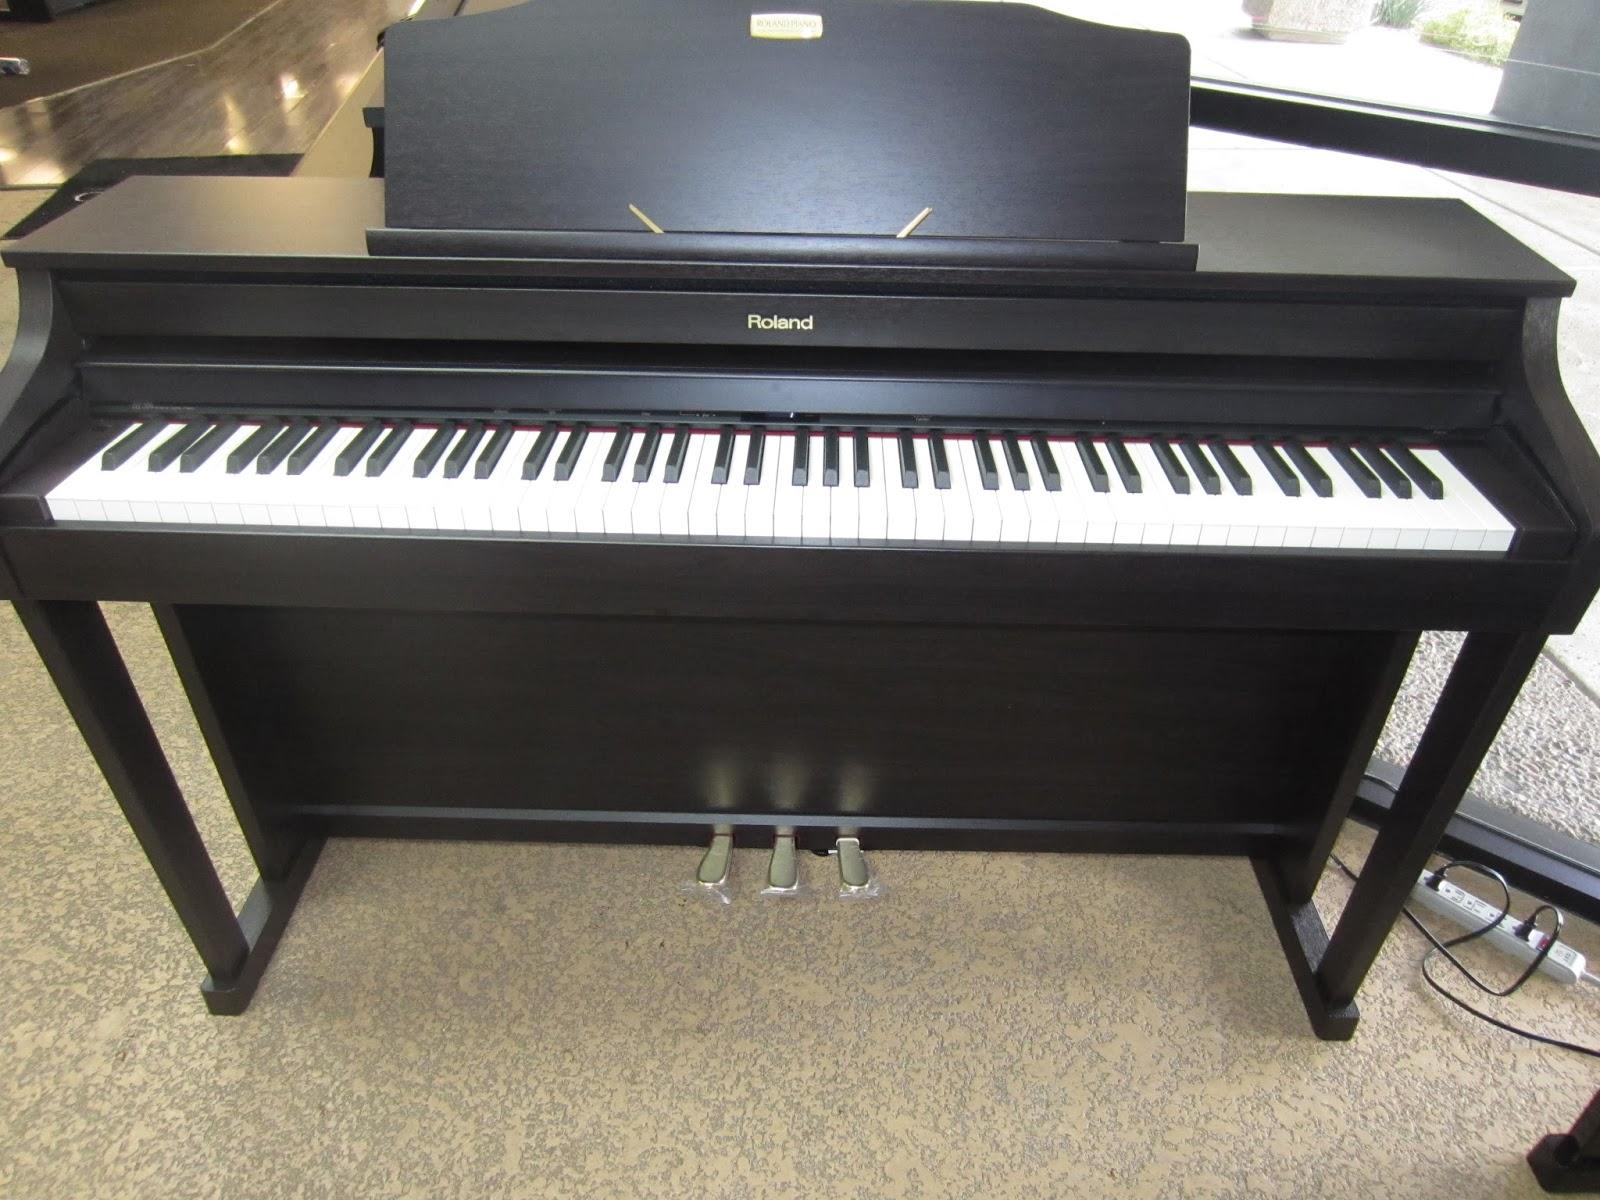 az piano reviews review yamaha cvp601 vs roland hp506 digital piano completely different. Black Bedroom Furniture Sets. Home Design Ideas